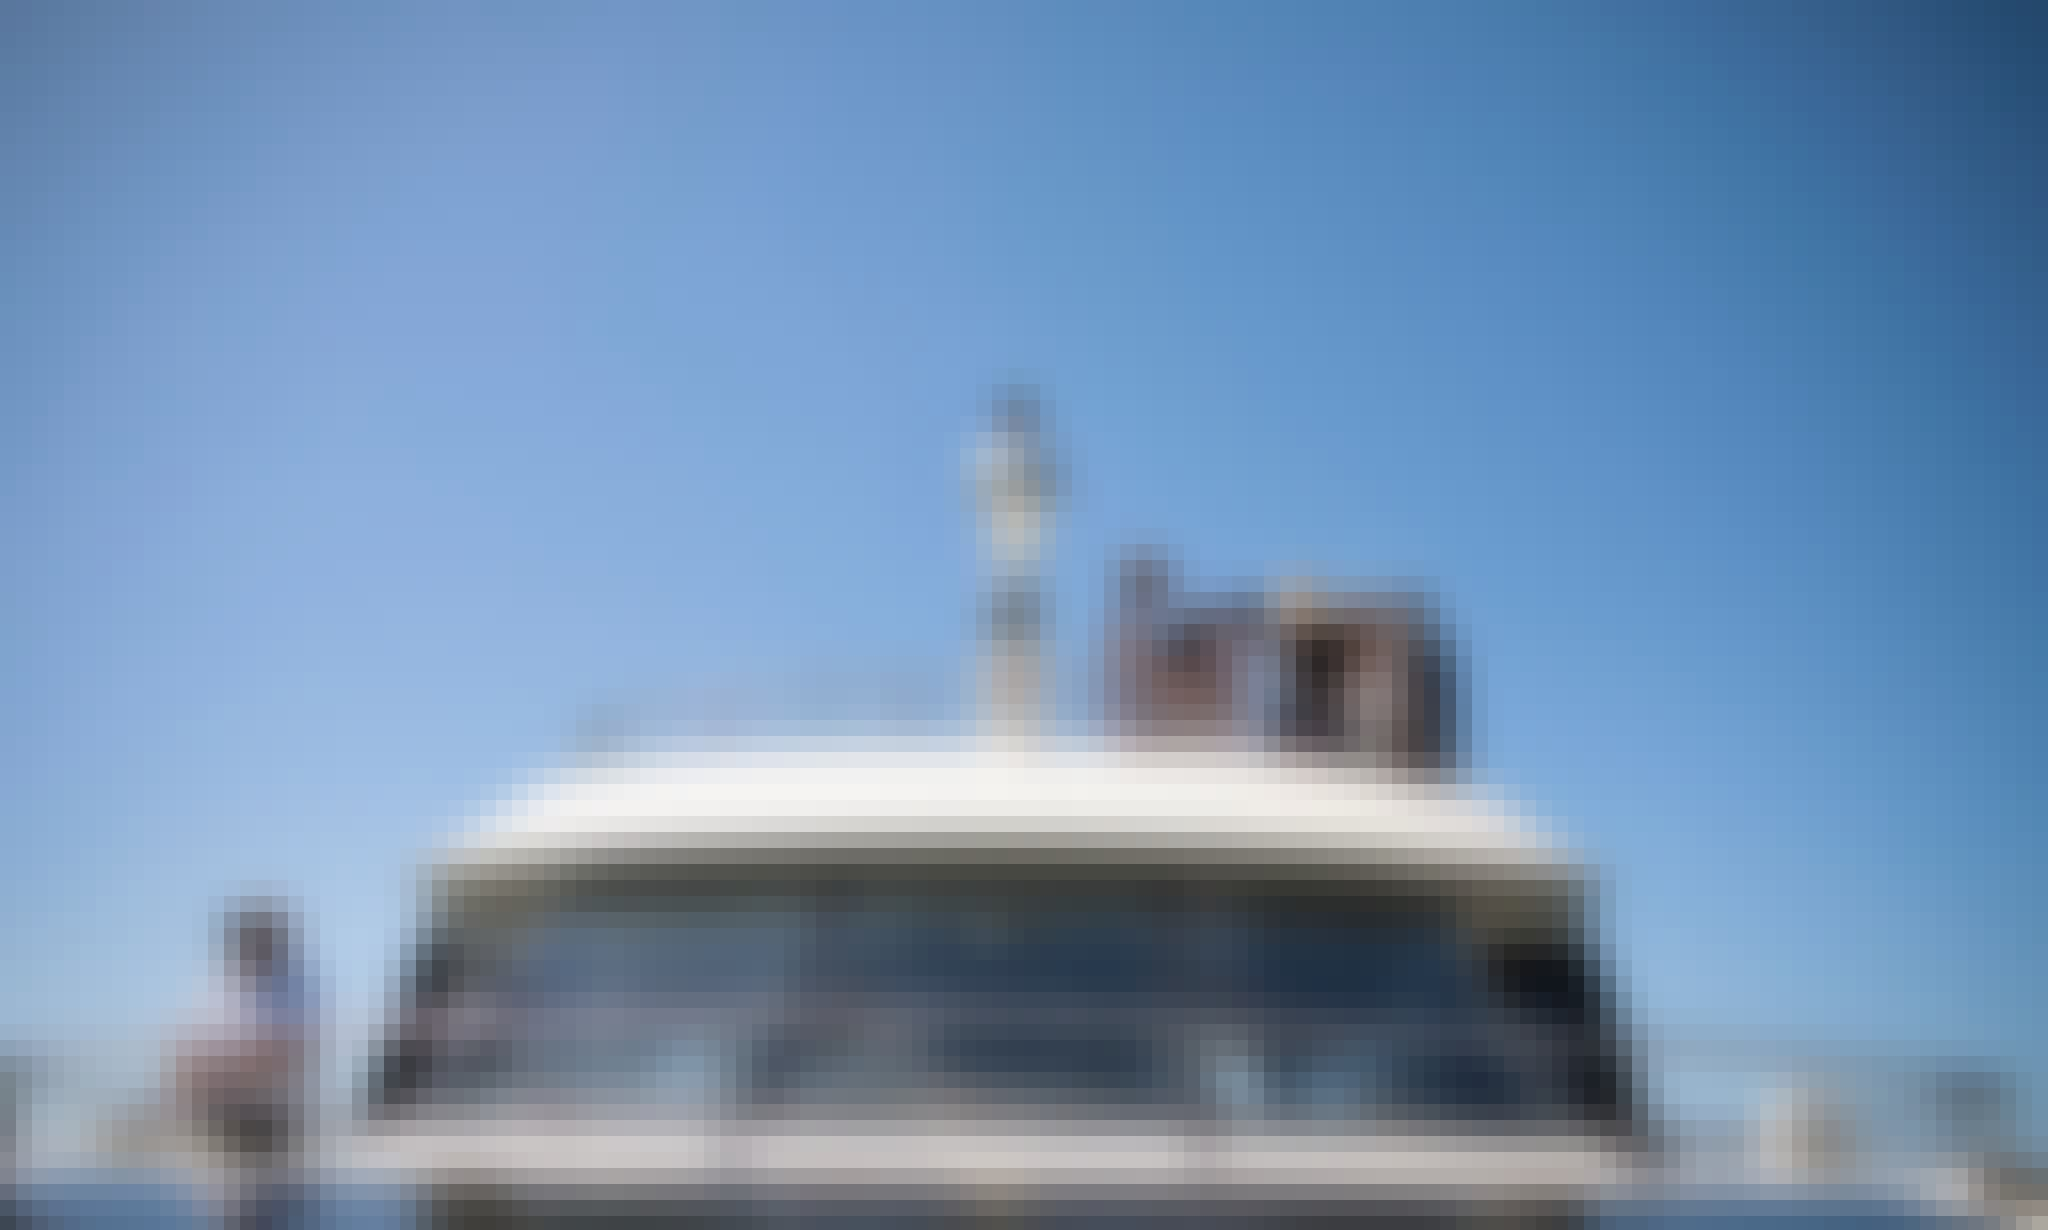 75' Peppermint Bay II Power Luxury Catamaran Private Hire in